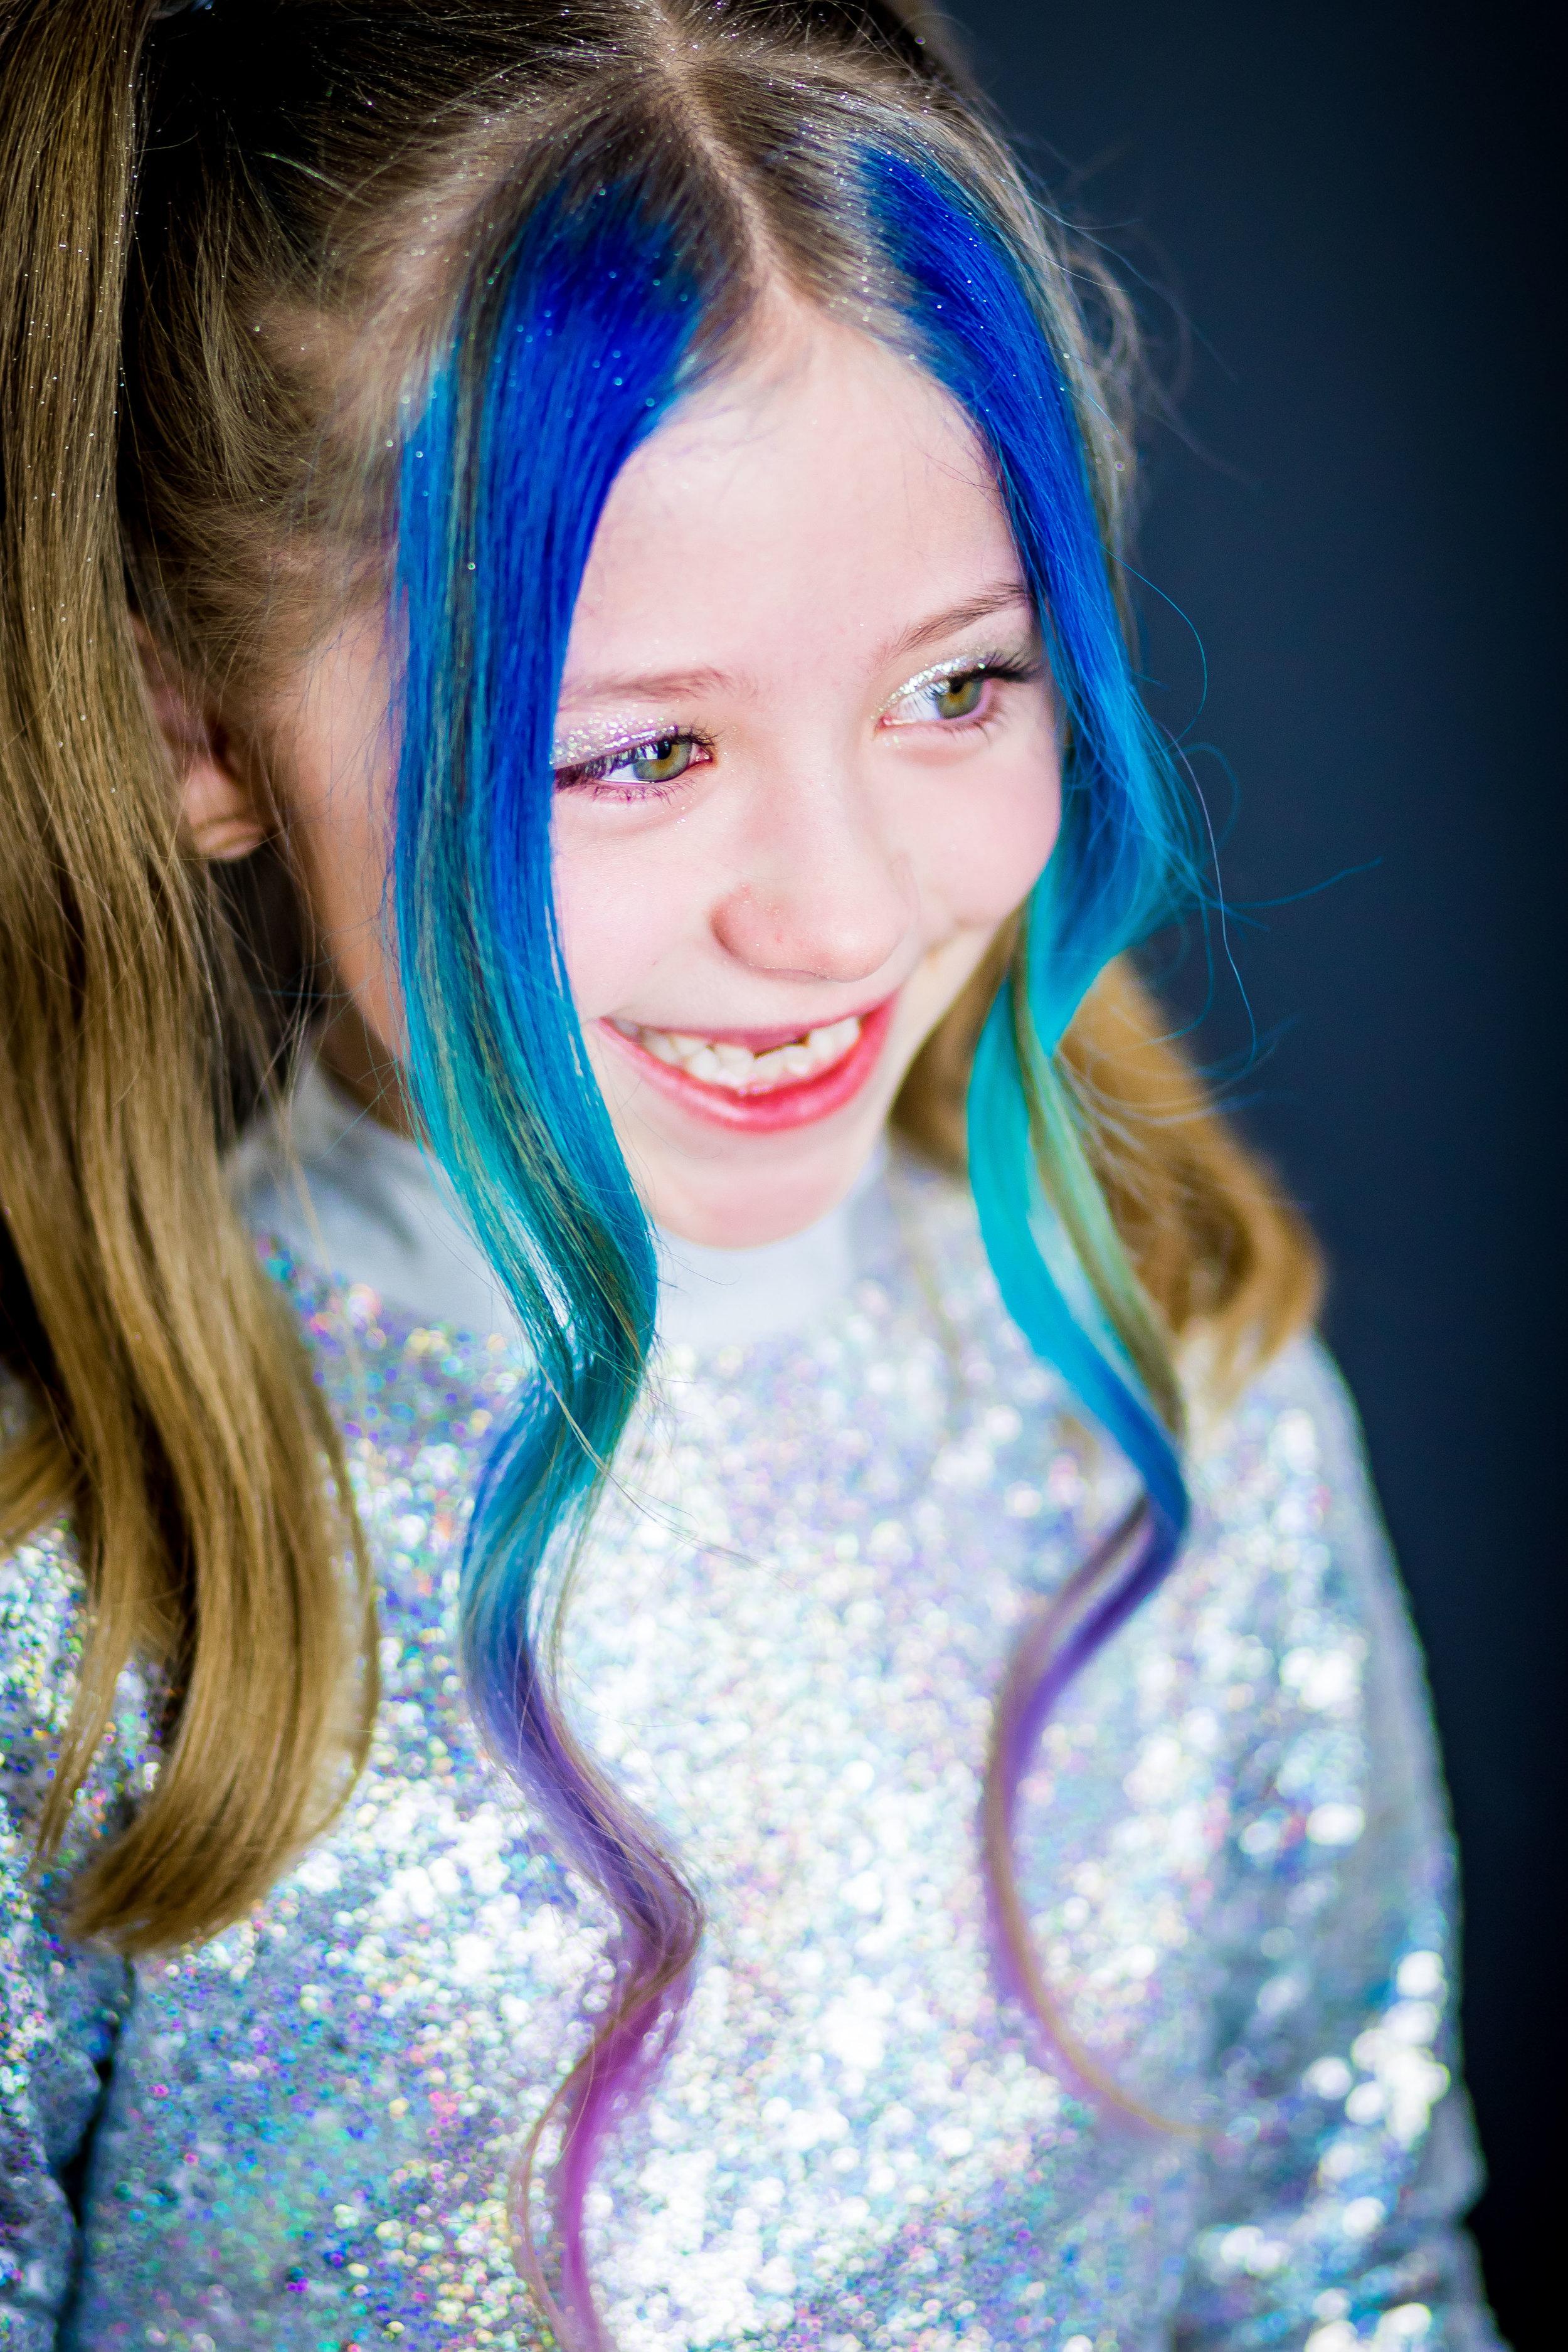 hair.color.art 2018-8437.jpg